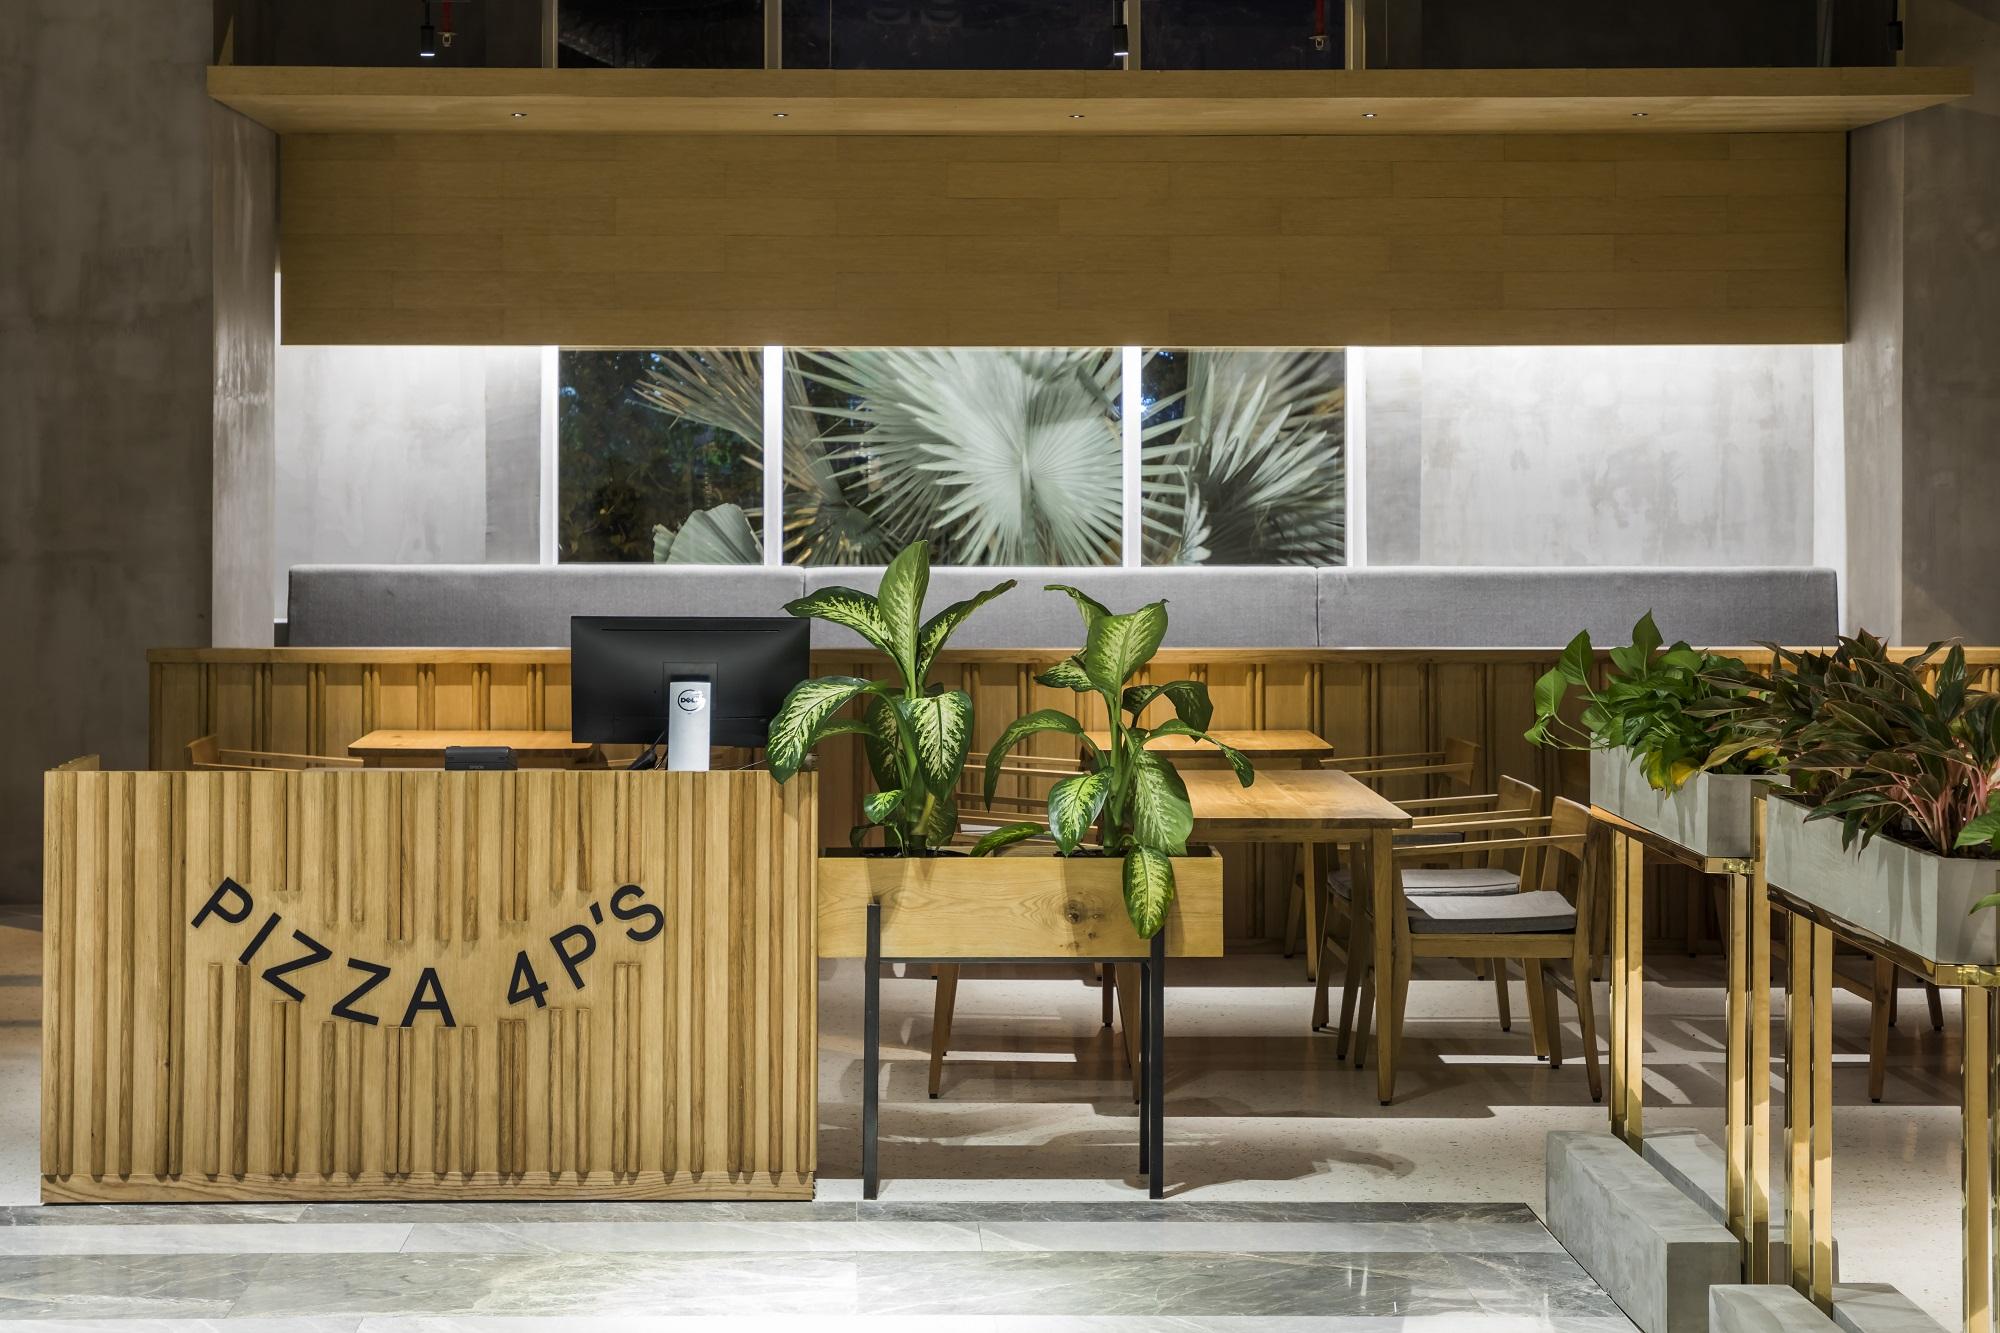 Pizza 4P's Le Dai Hanh – HCM